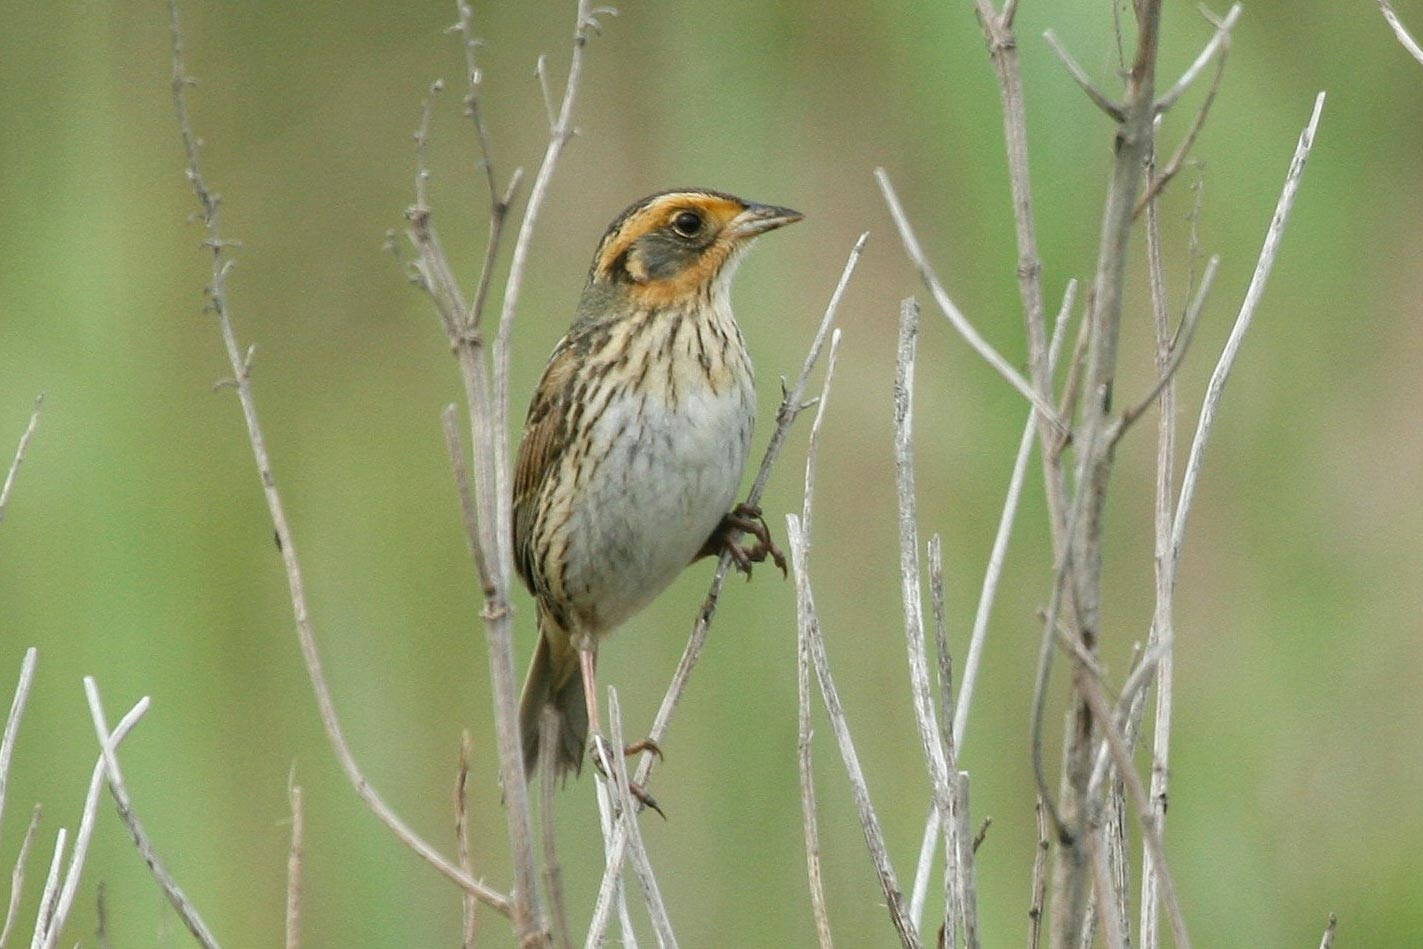 Climate change puts endangered sparrows at risk